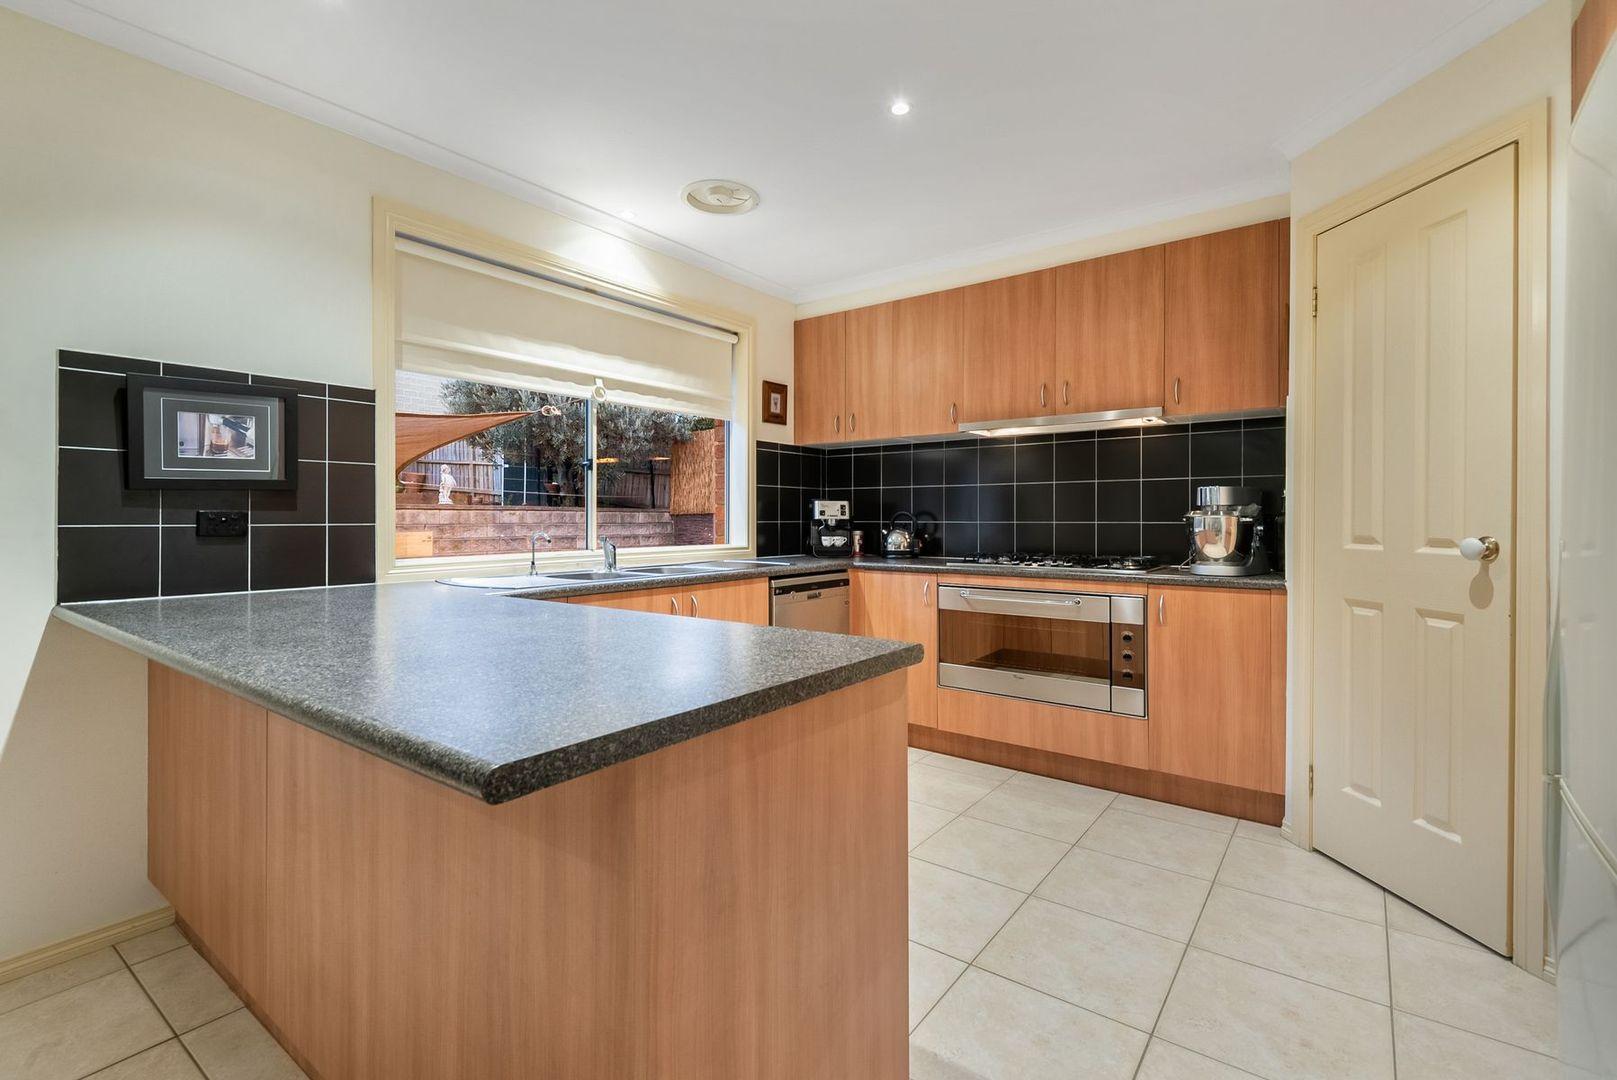 16 Crestmont Terrace, Craigieburn VIC 3064, Image 2